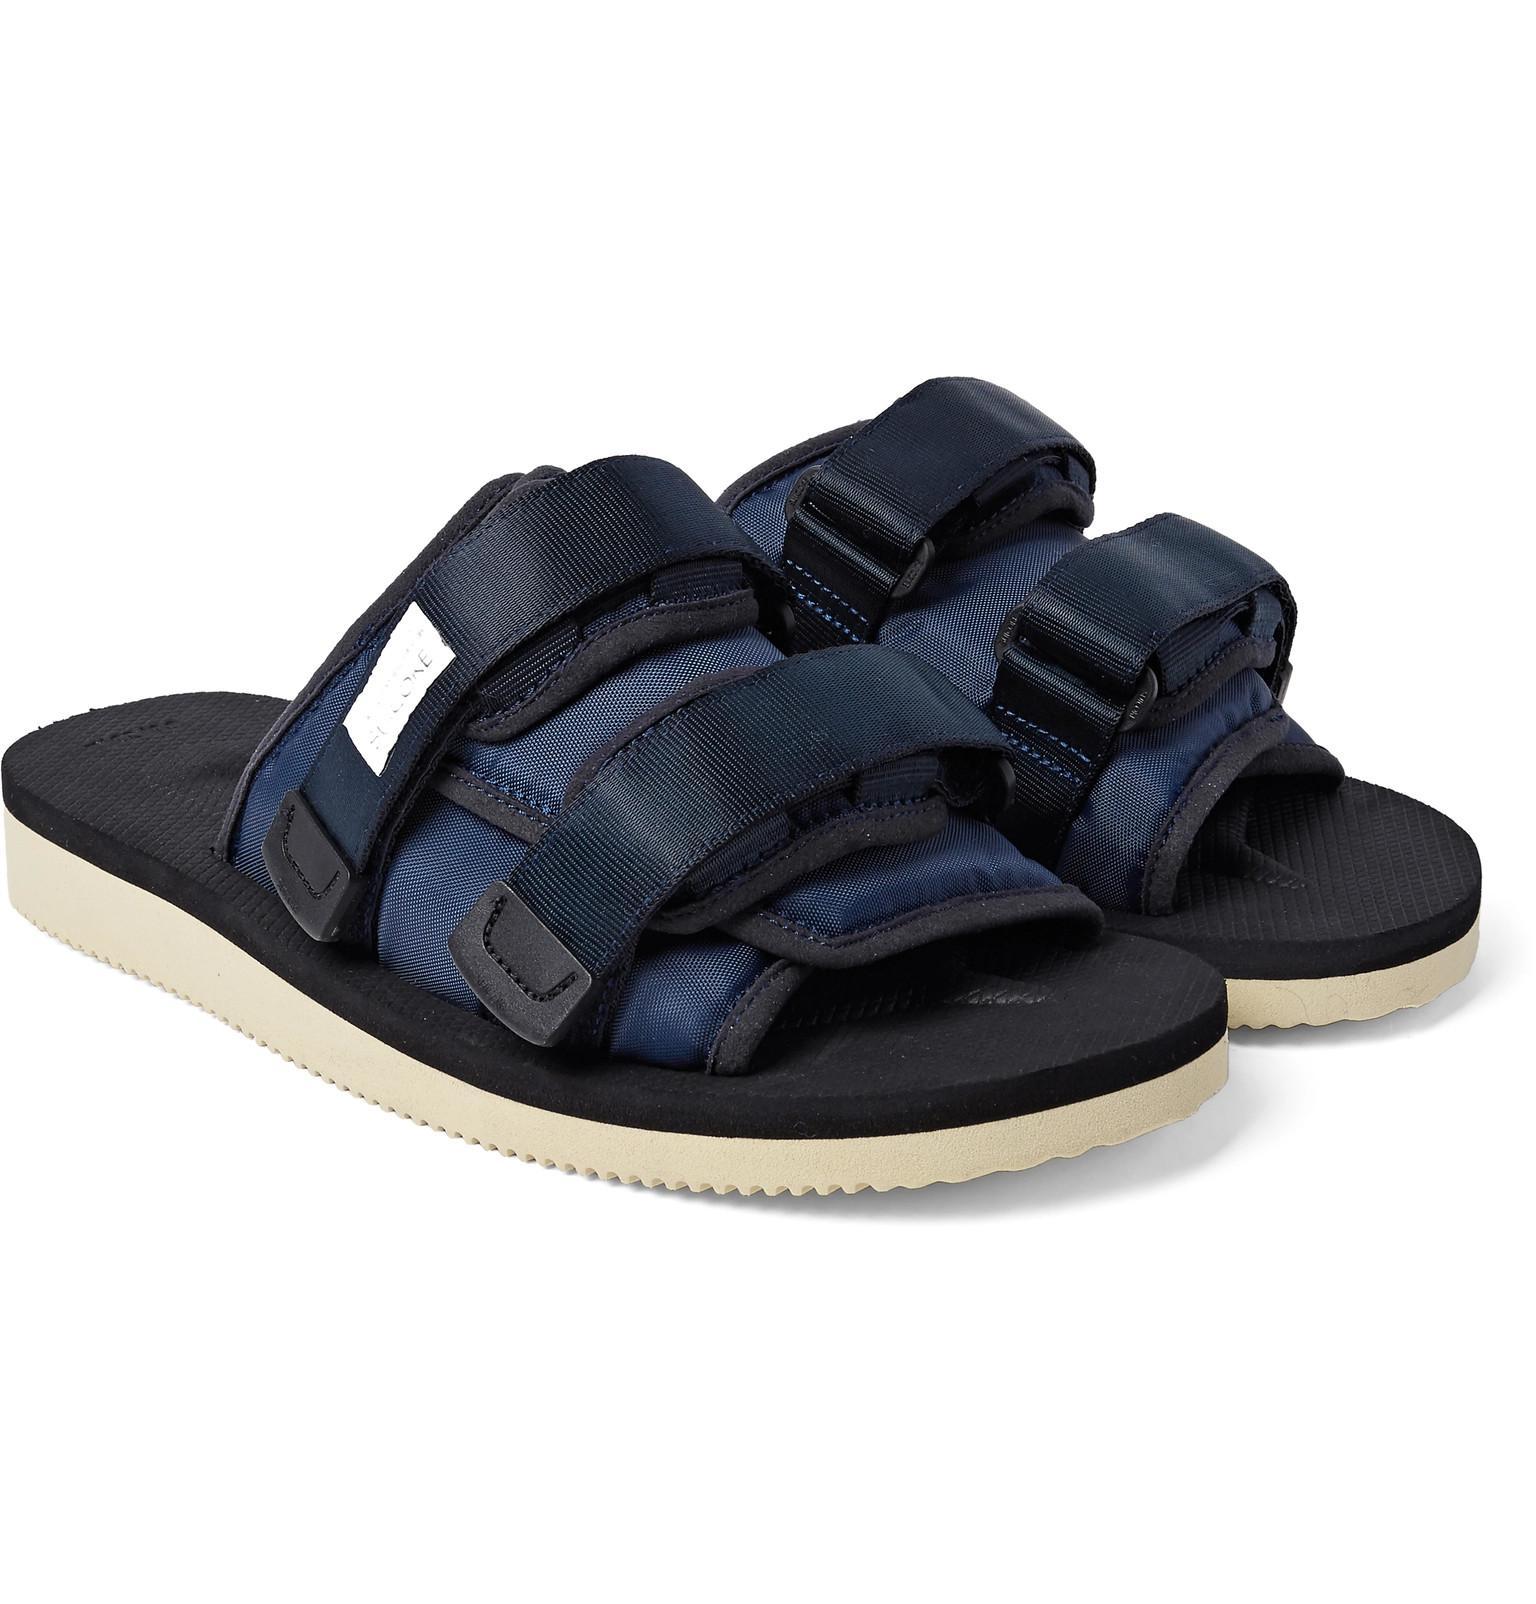 Blue Suede Shoes Brand Sandals